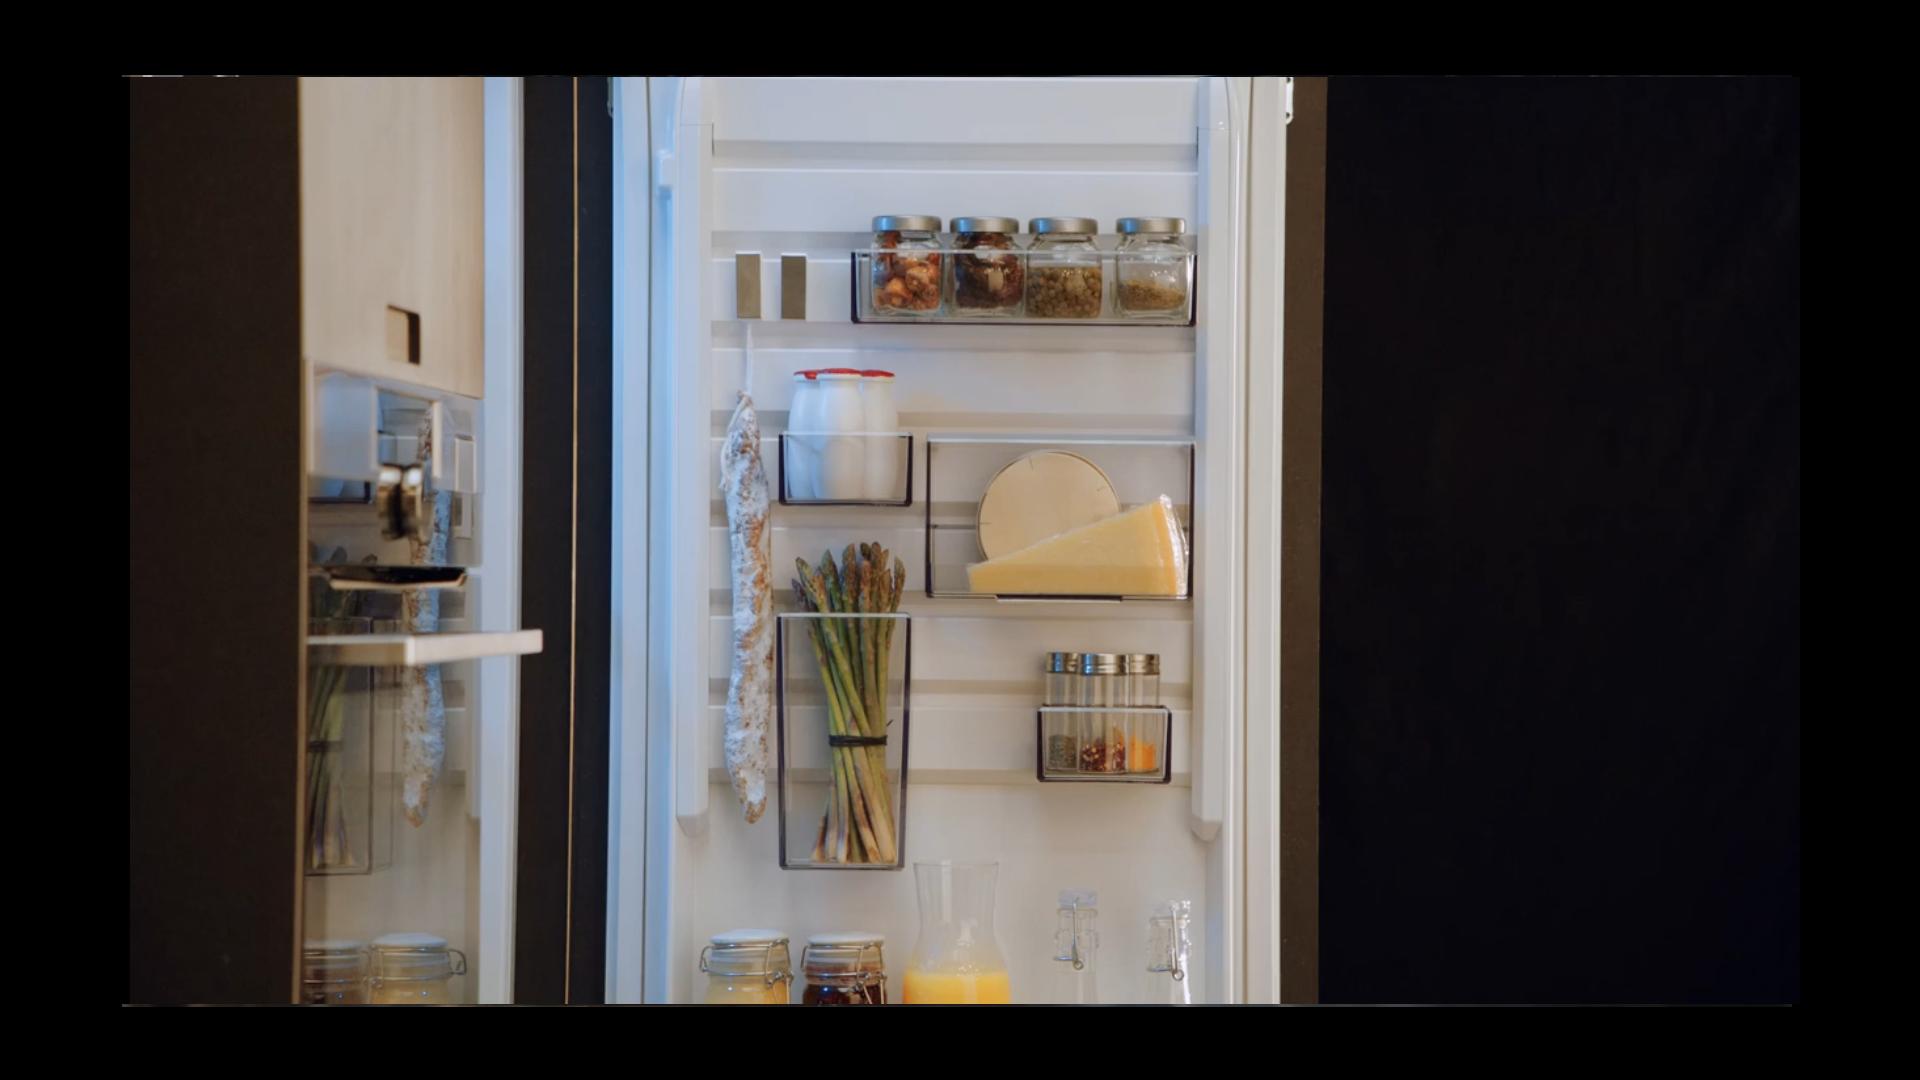 Aeg Customflex Kühlschrank : Aeg kühlschrank mit customflex elektrogeräte im raum